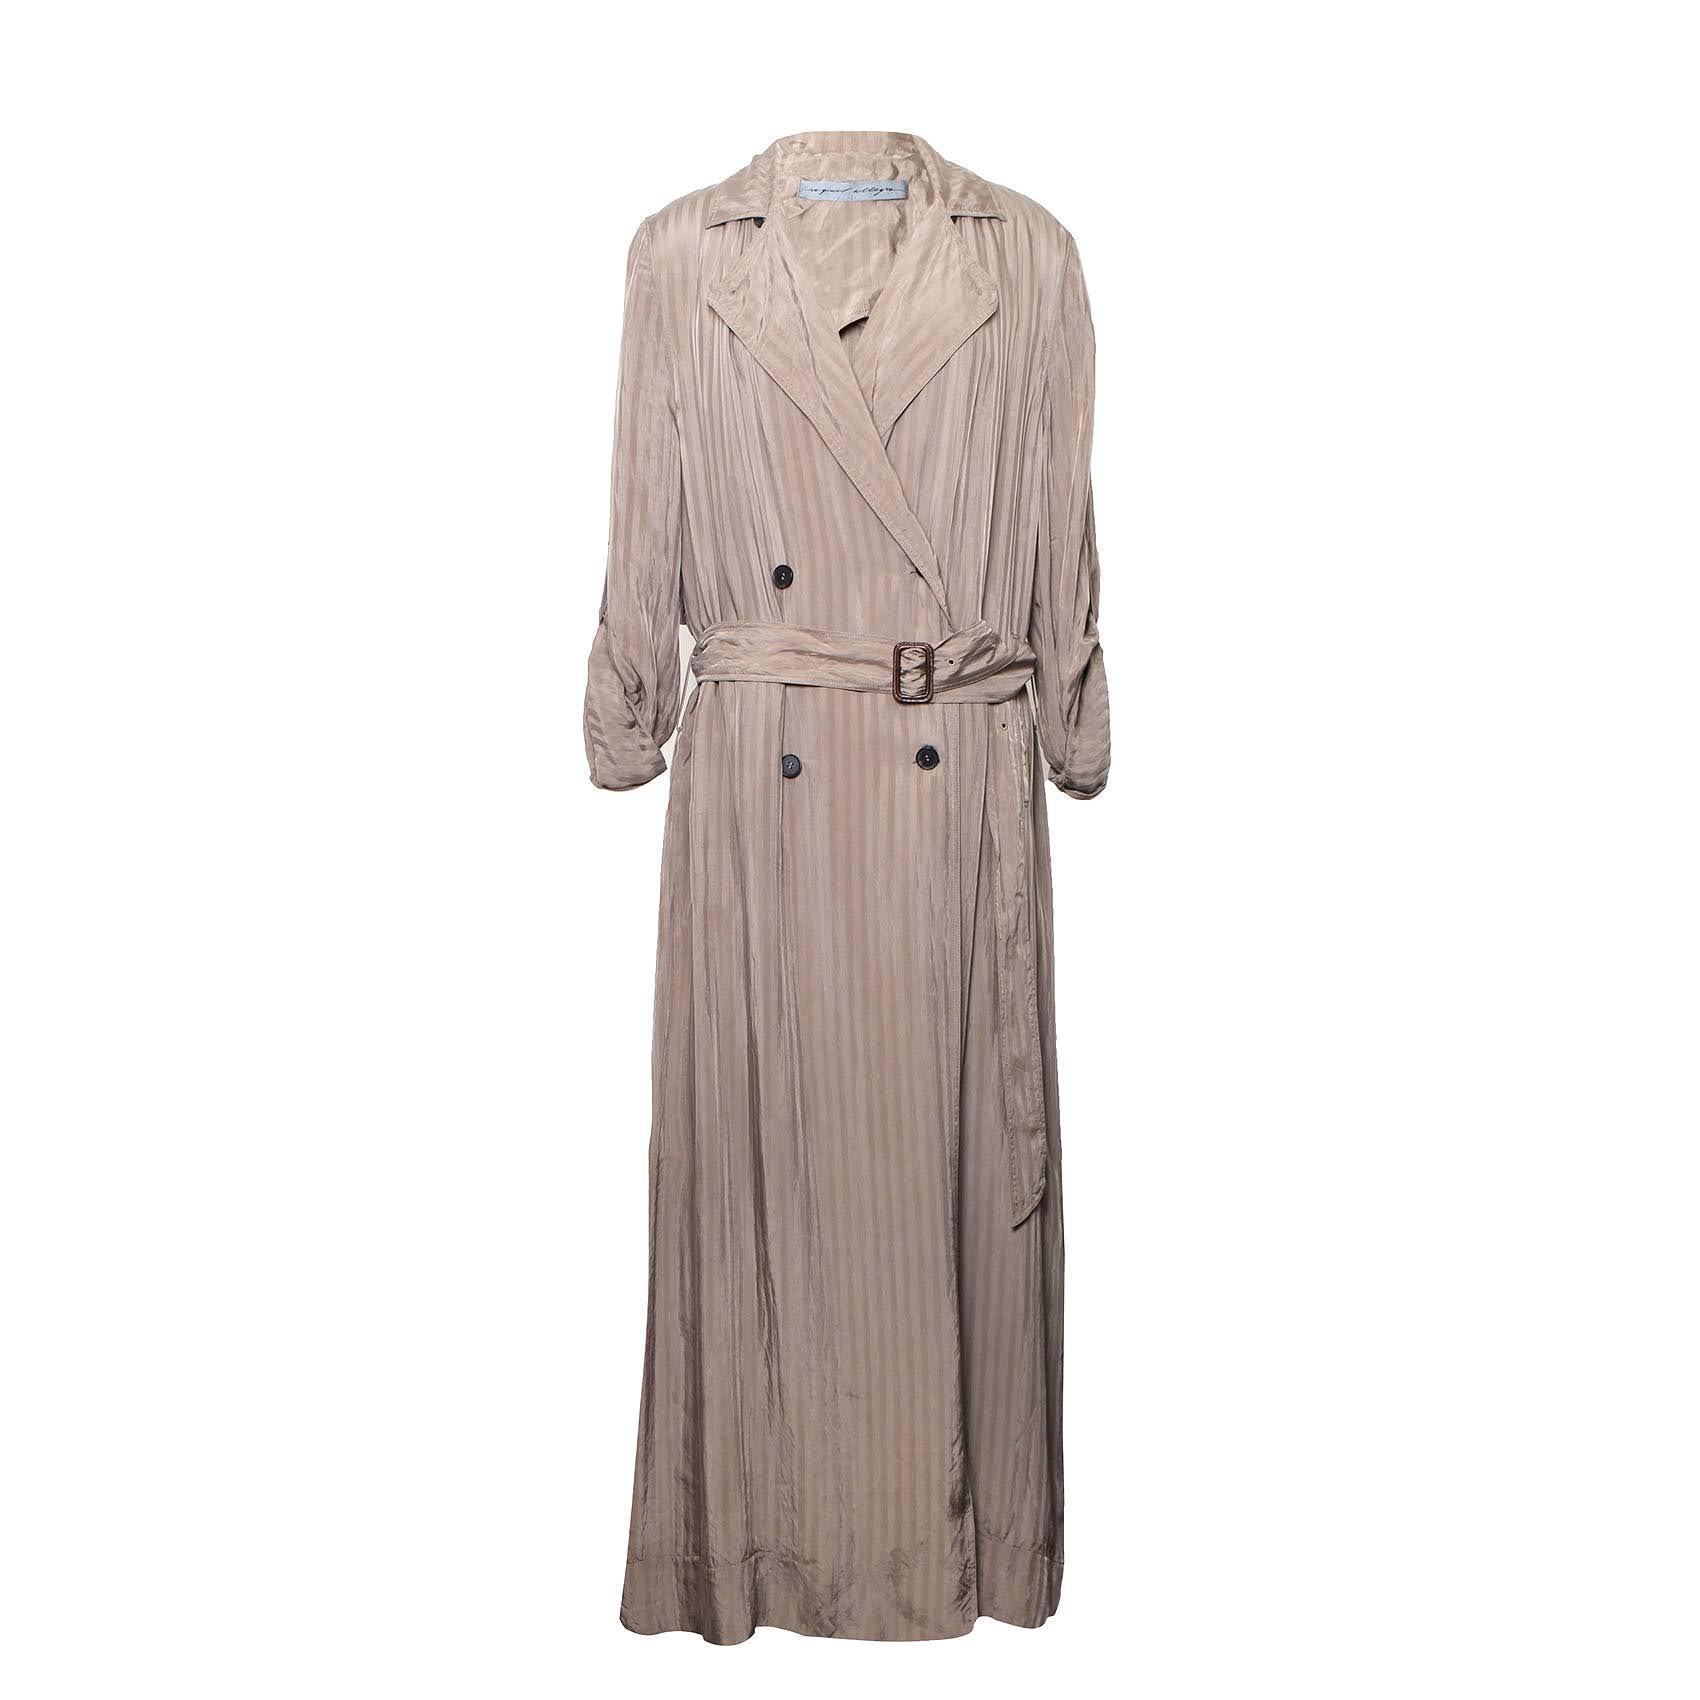 Raquel Allegra Size 2 Khaki Trench Dress